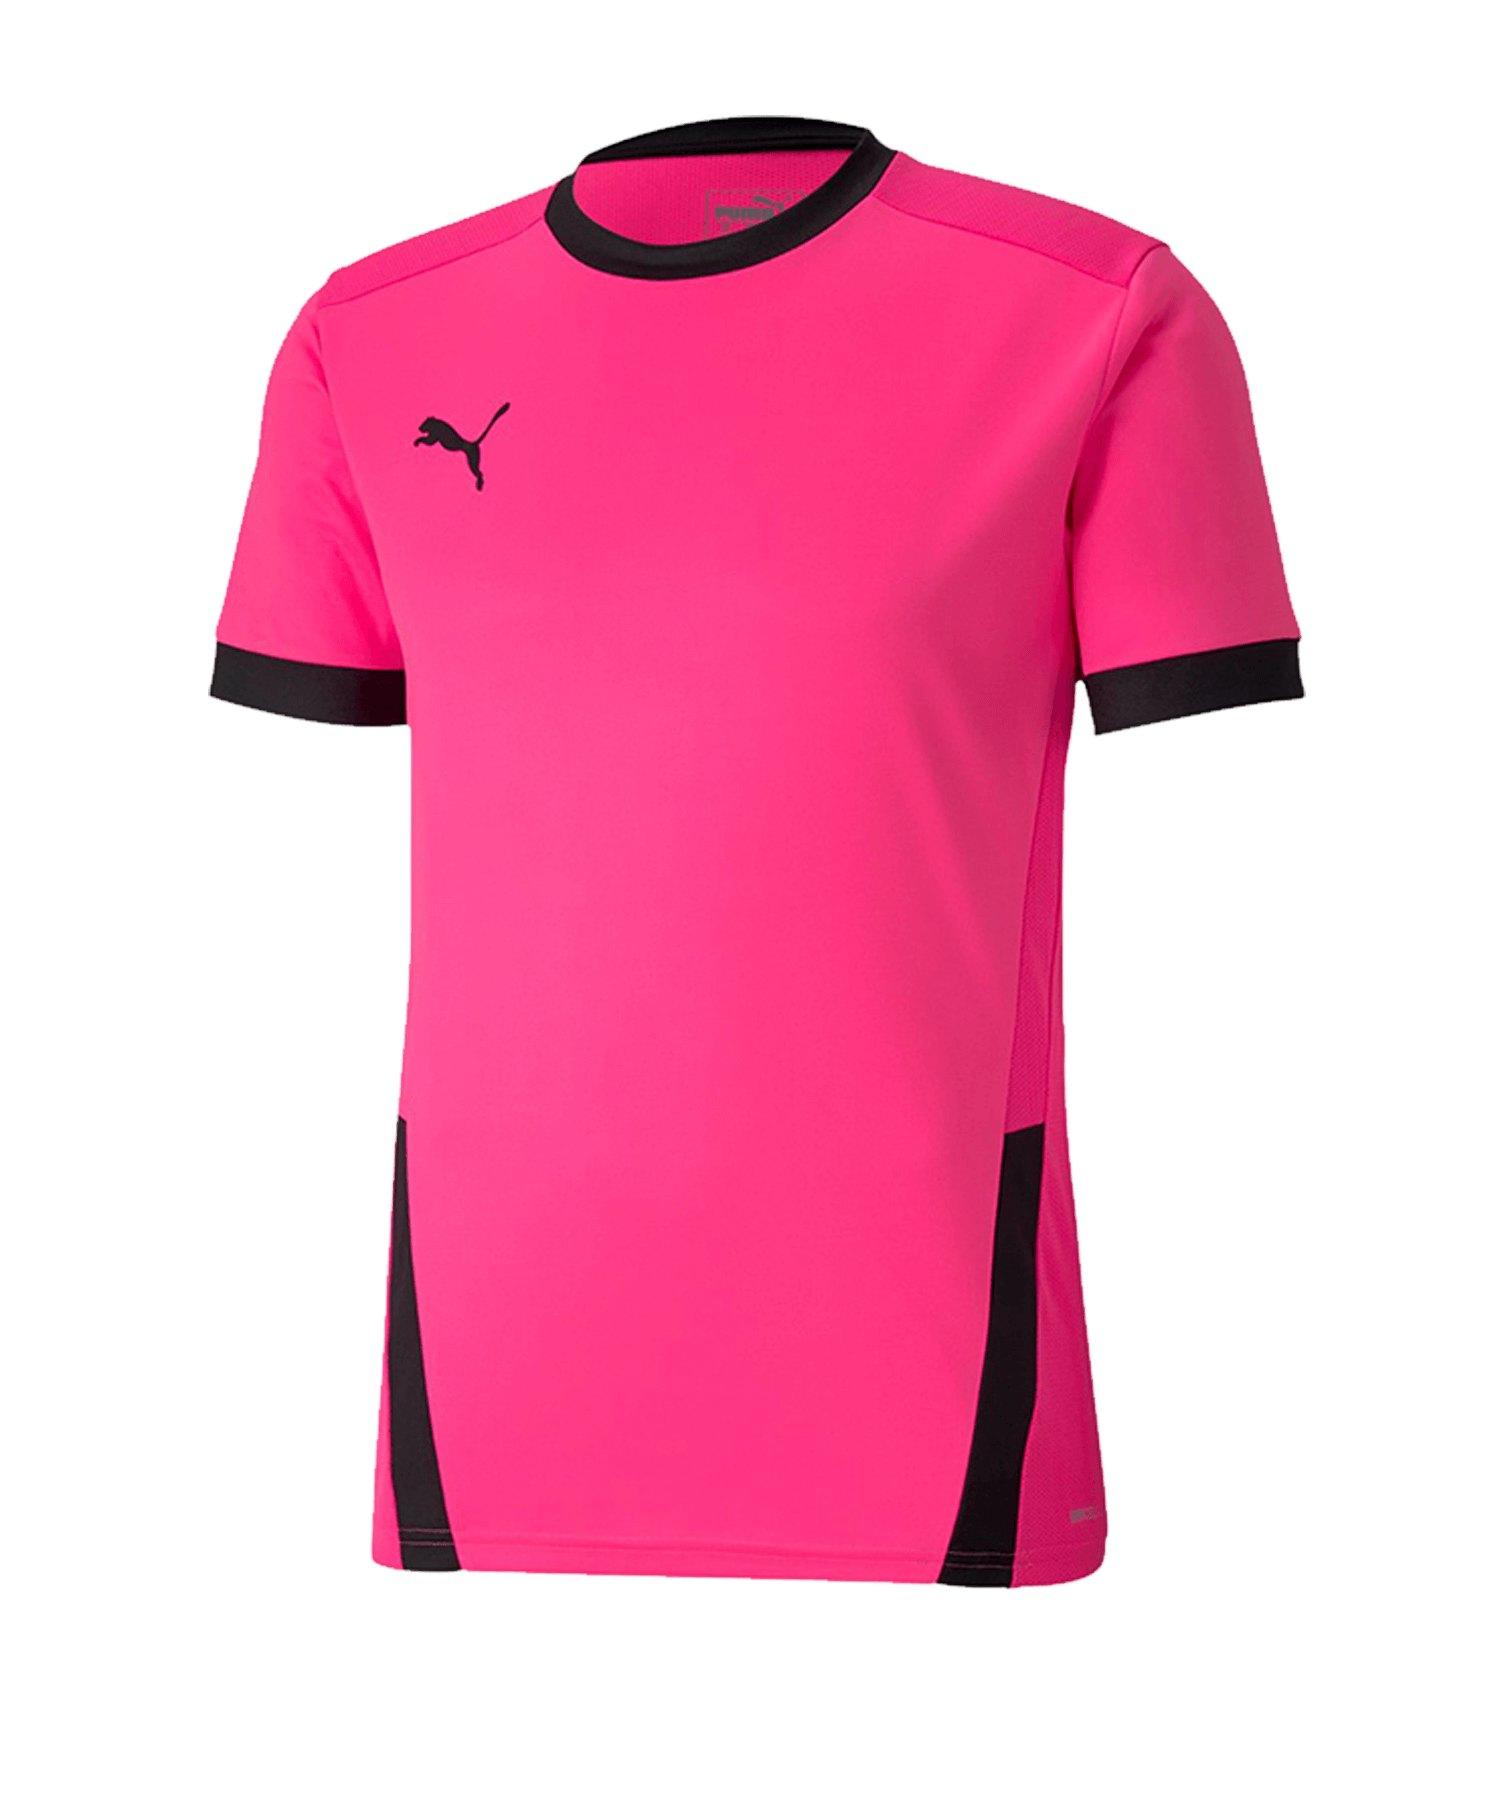 PUMA teamGOAL 23 Trikot kurzarm Pink F25 - pink